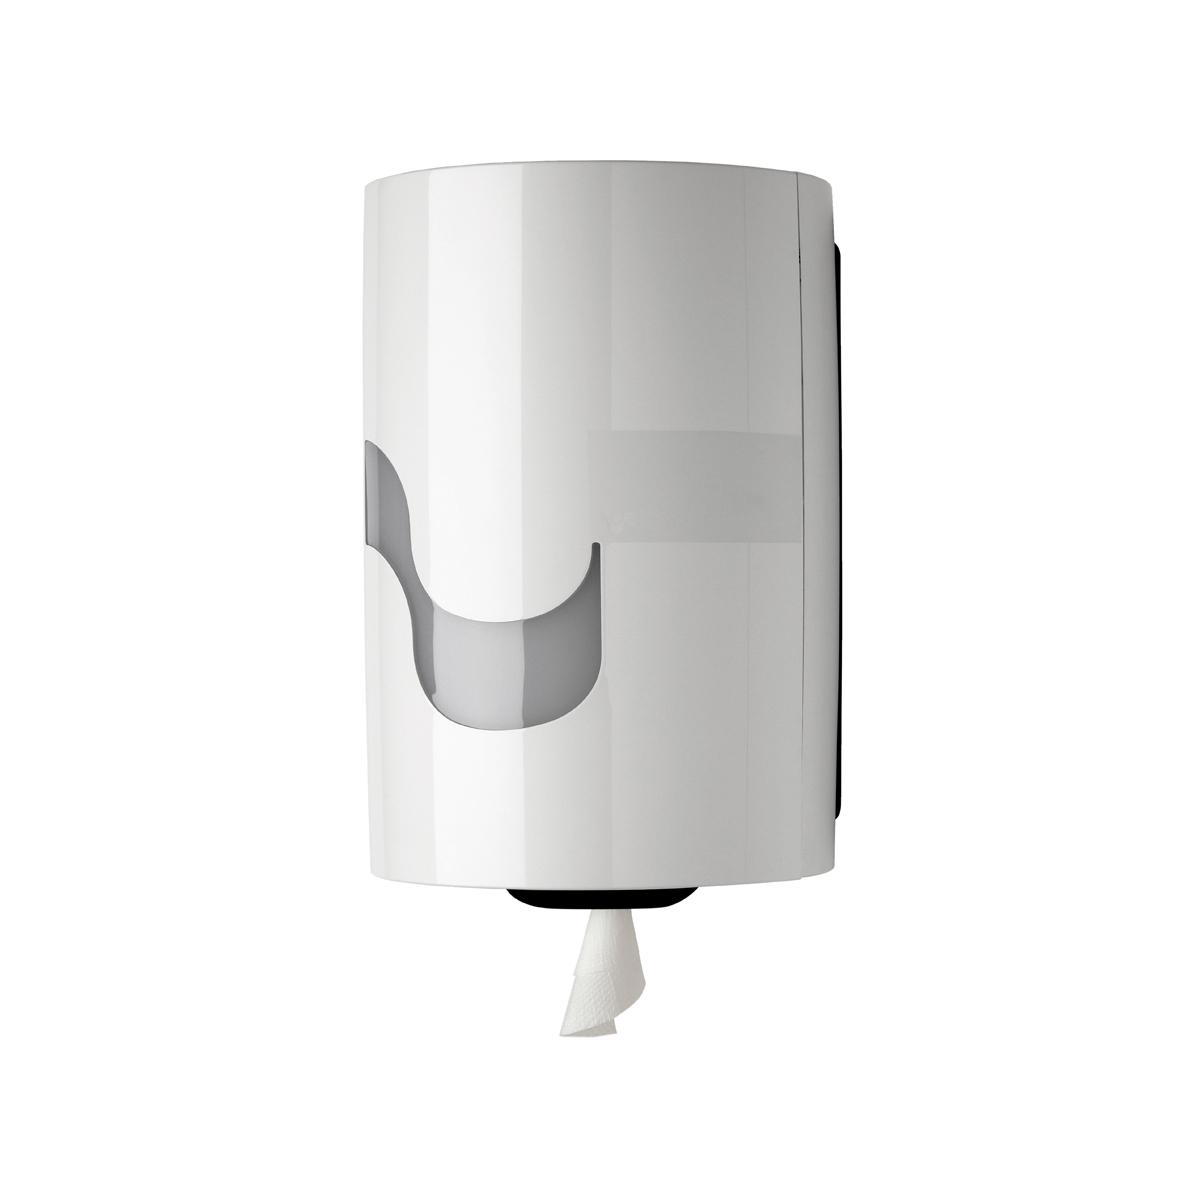 Handtuchrollenspender midi perfo Box weiß